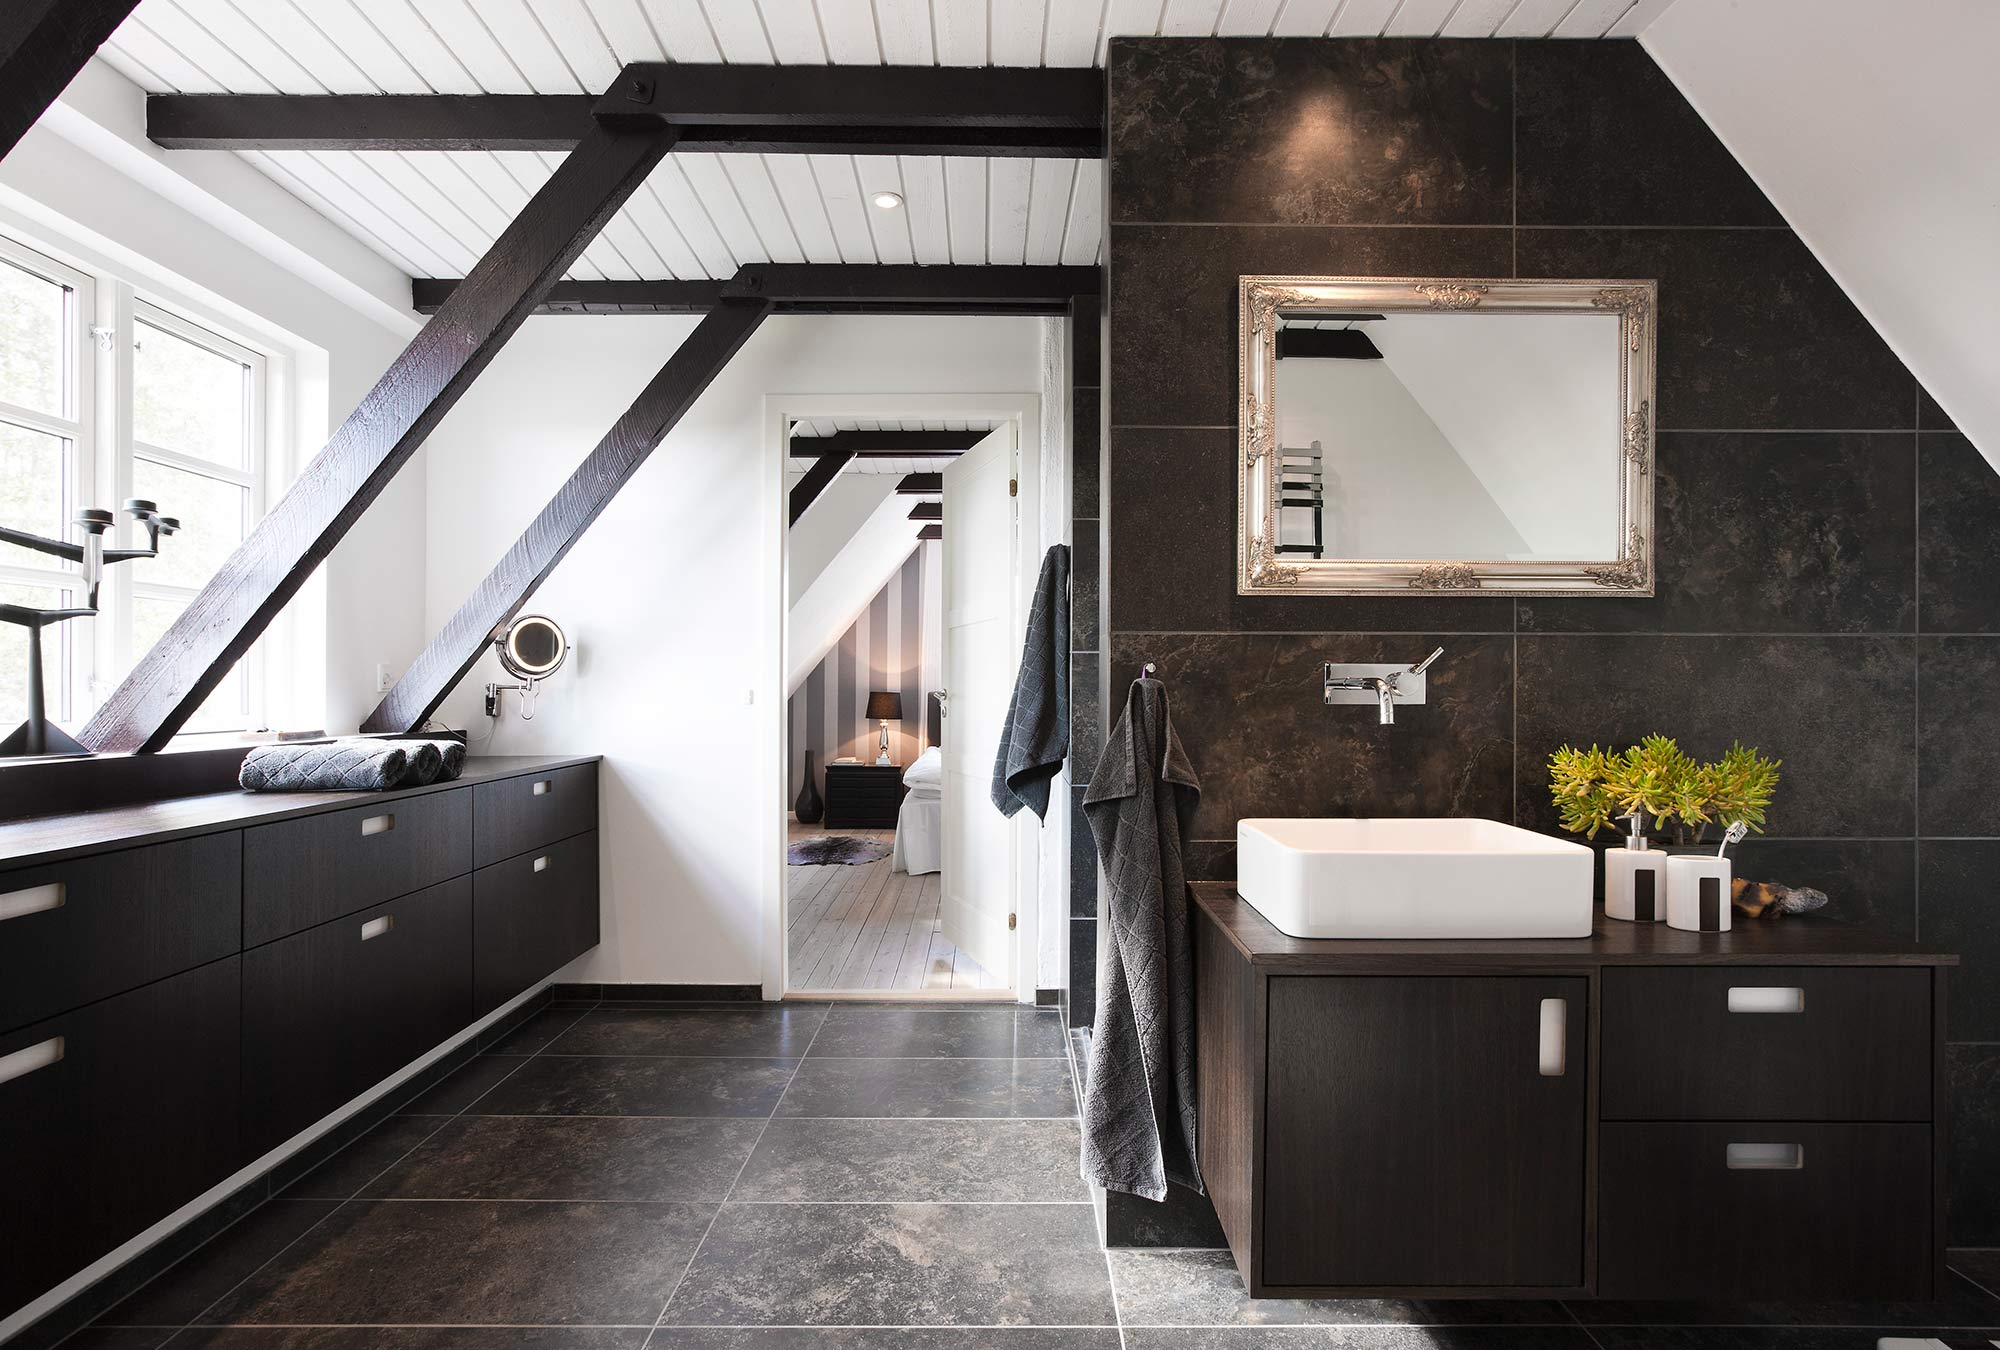 Badezimmer - Tischlerei Hageböck